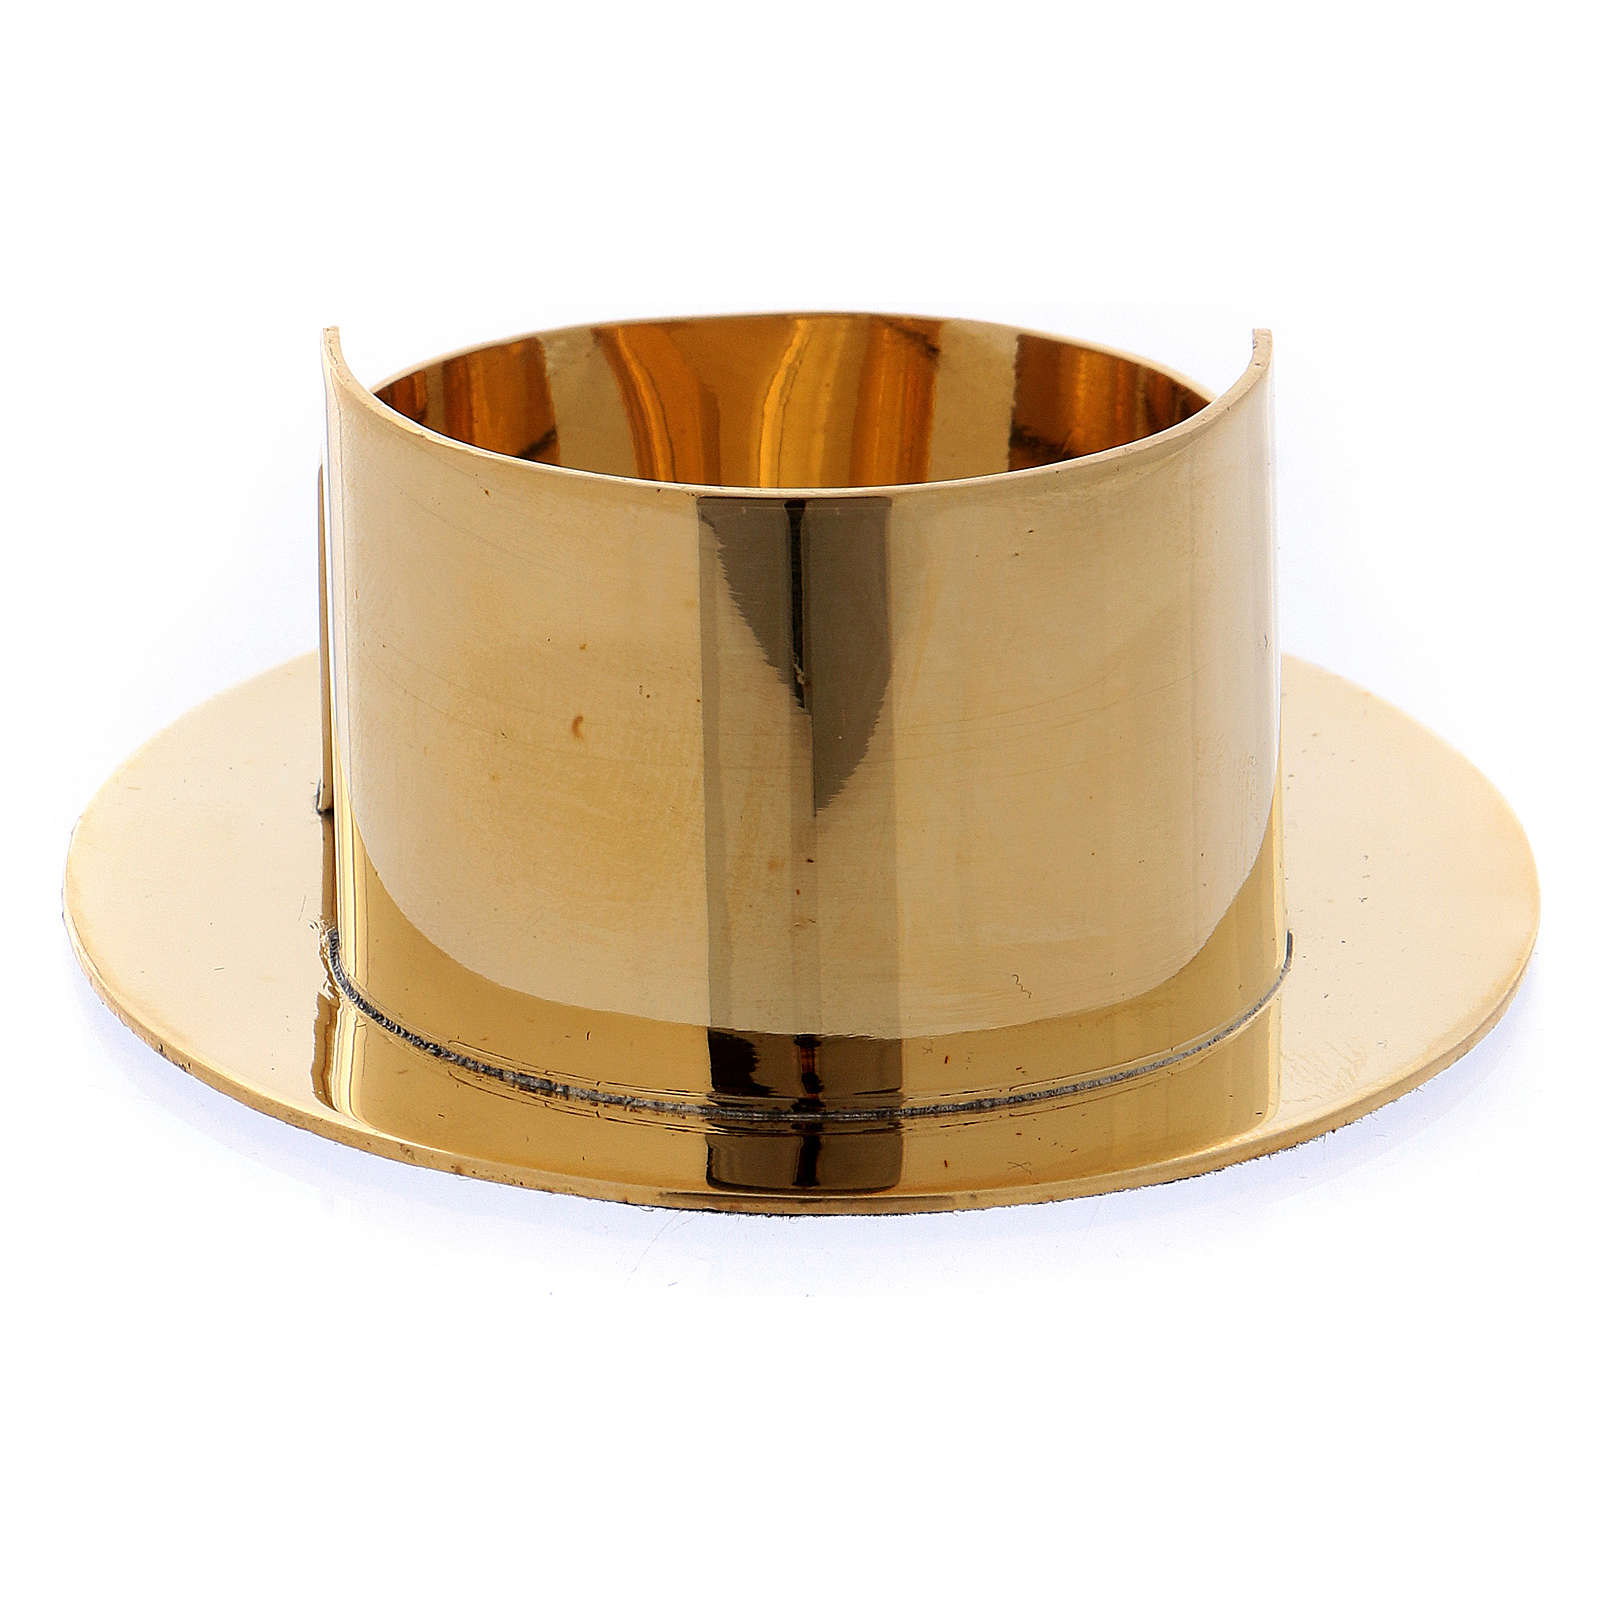 Portacandele moderno forma ovale ottone oro lucido 6 cm 4